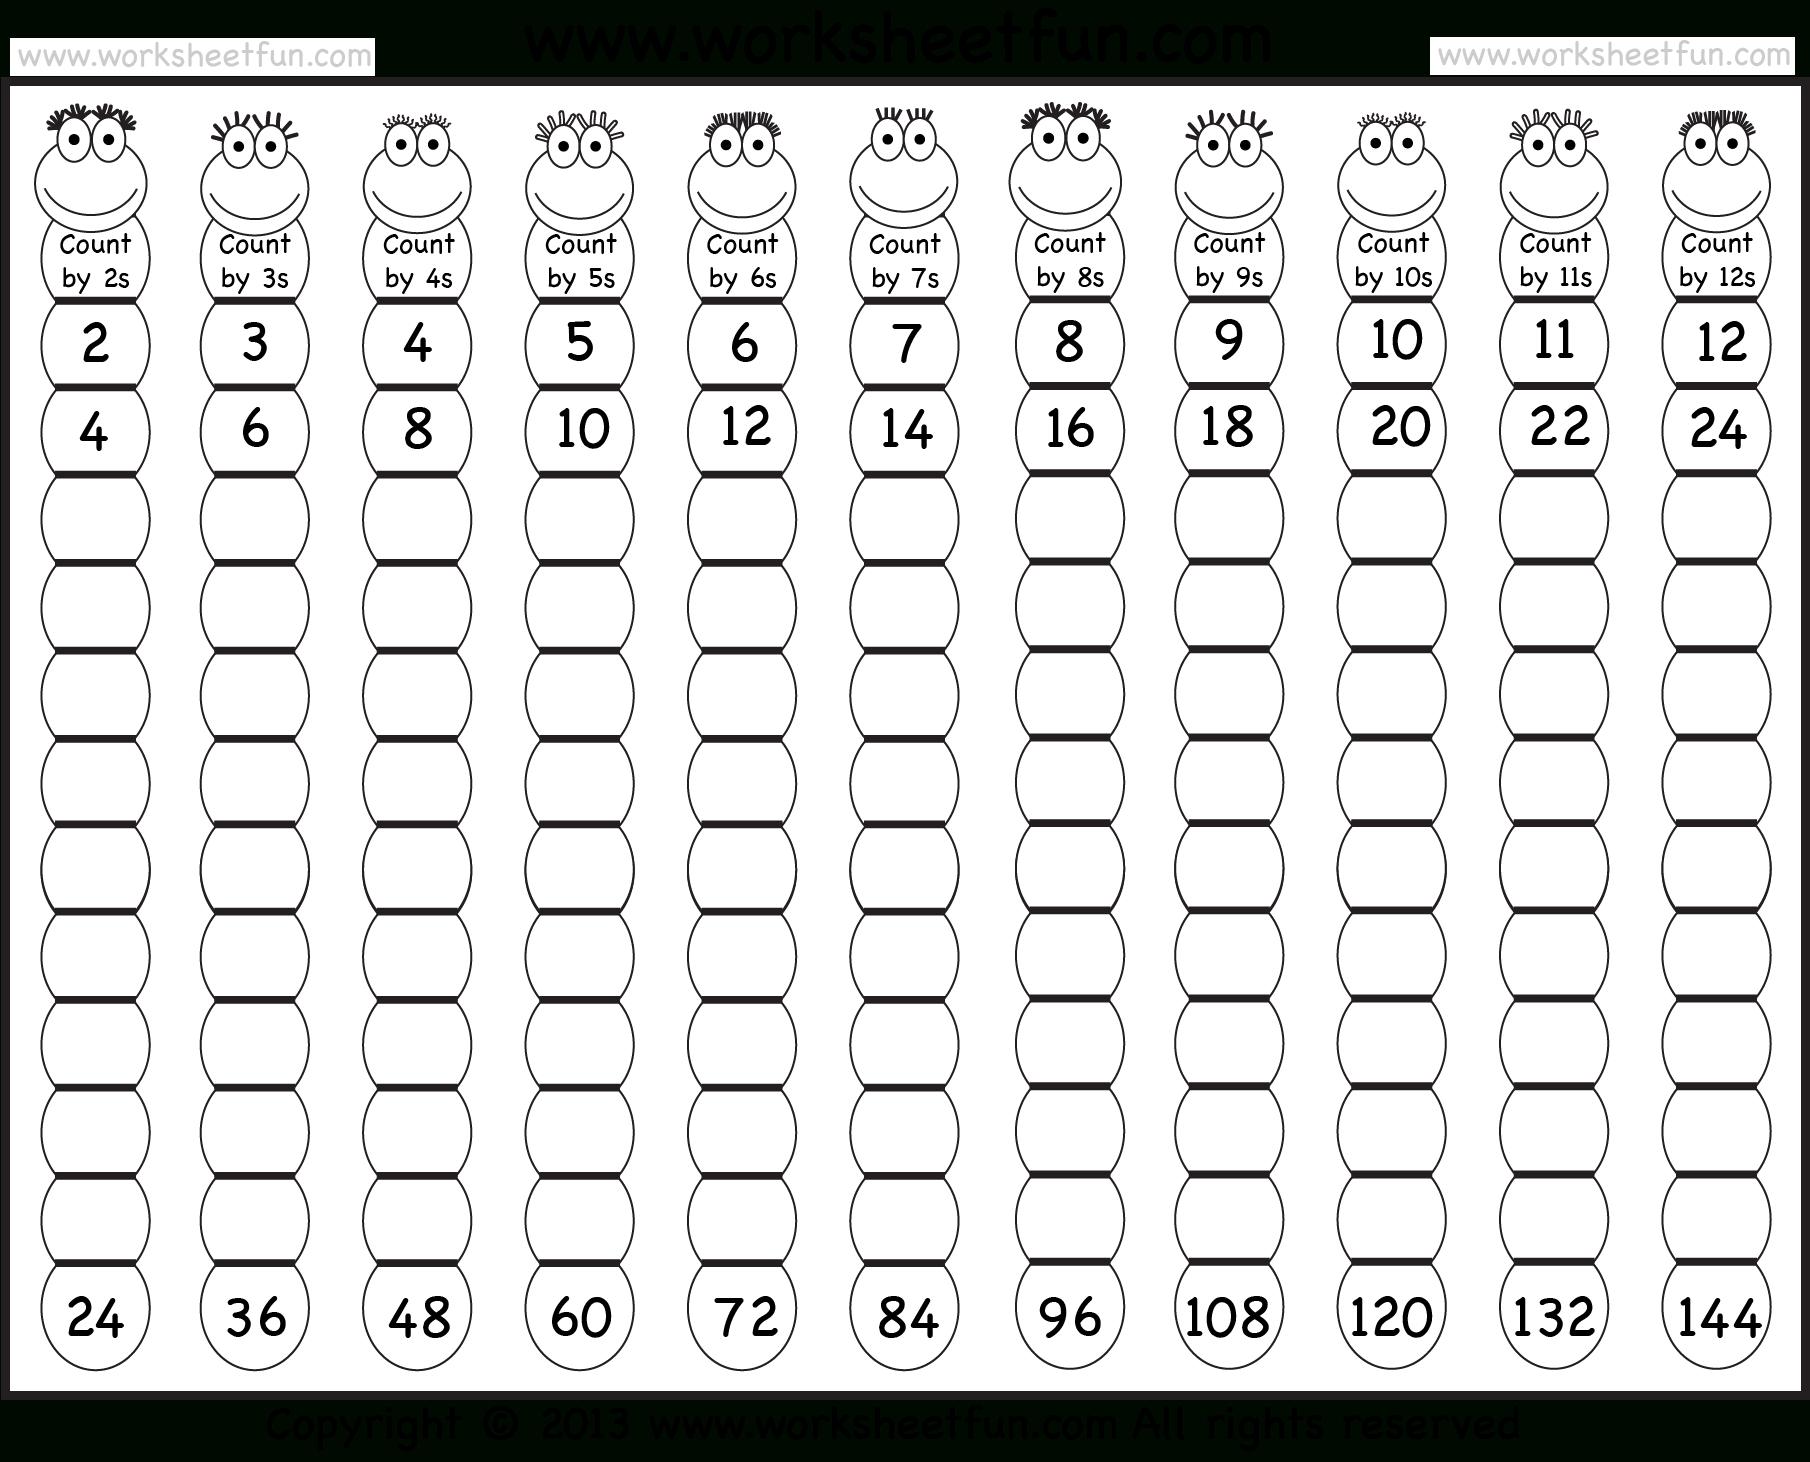 Times Table – 2-12 Worksheets – 1, 2, 3, 4, 5, 6, 7, 8, 9, 10, 11 - Free Printable Skip Counting Worksheets